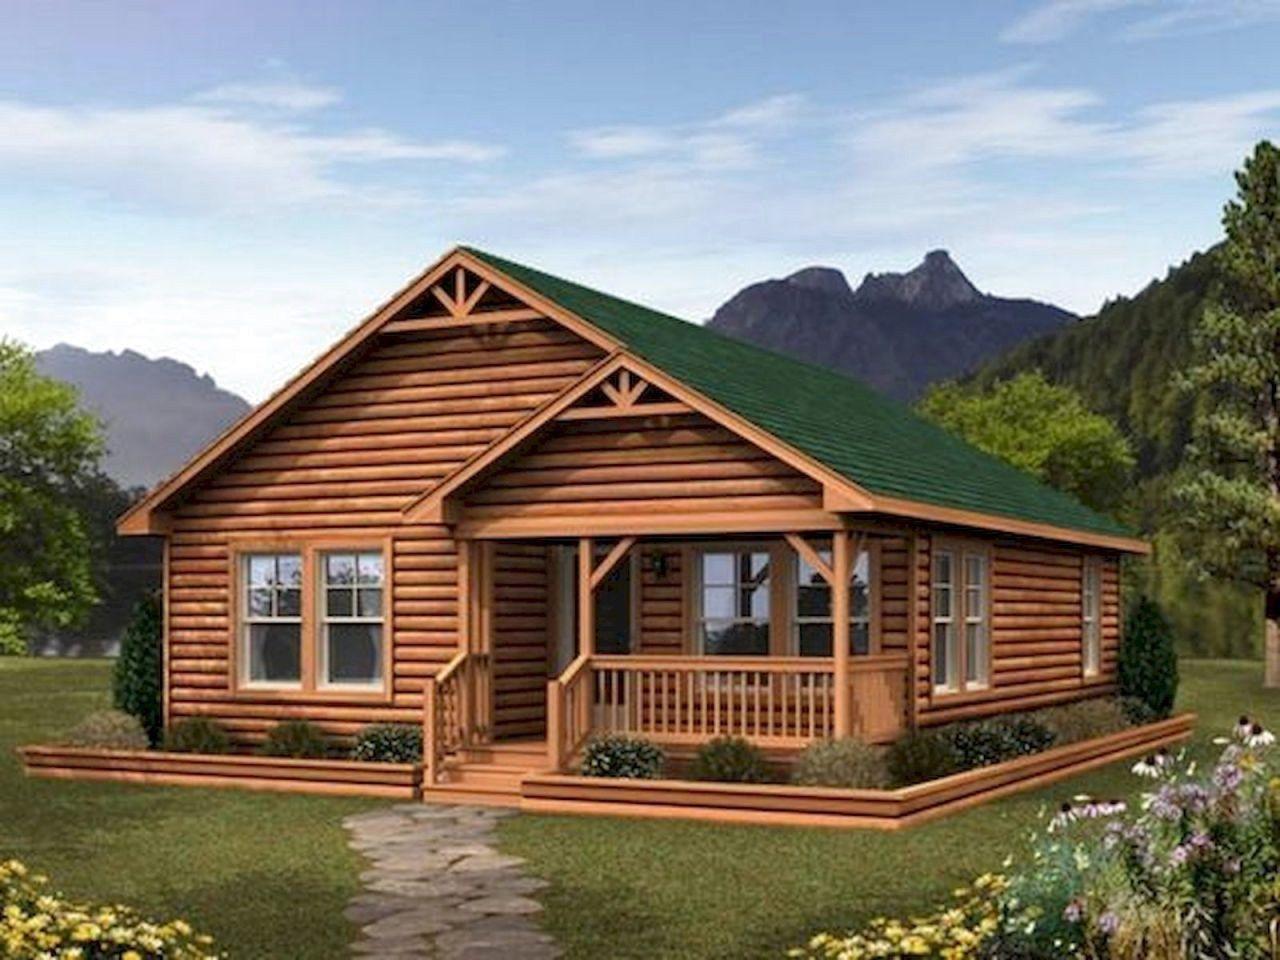 Favorite Log Cabin Homes Plans One Story Design Ideas Frugal Living Log Cabin Modular Homes Prefab Log Homes Small Log Cabin